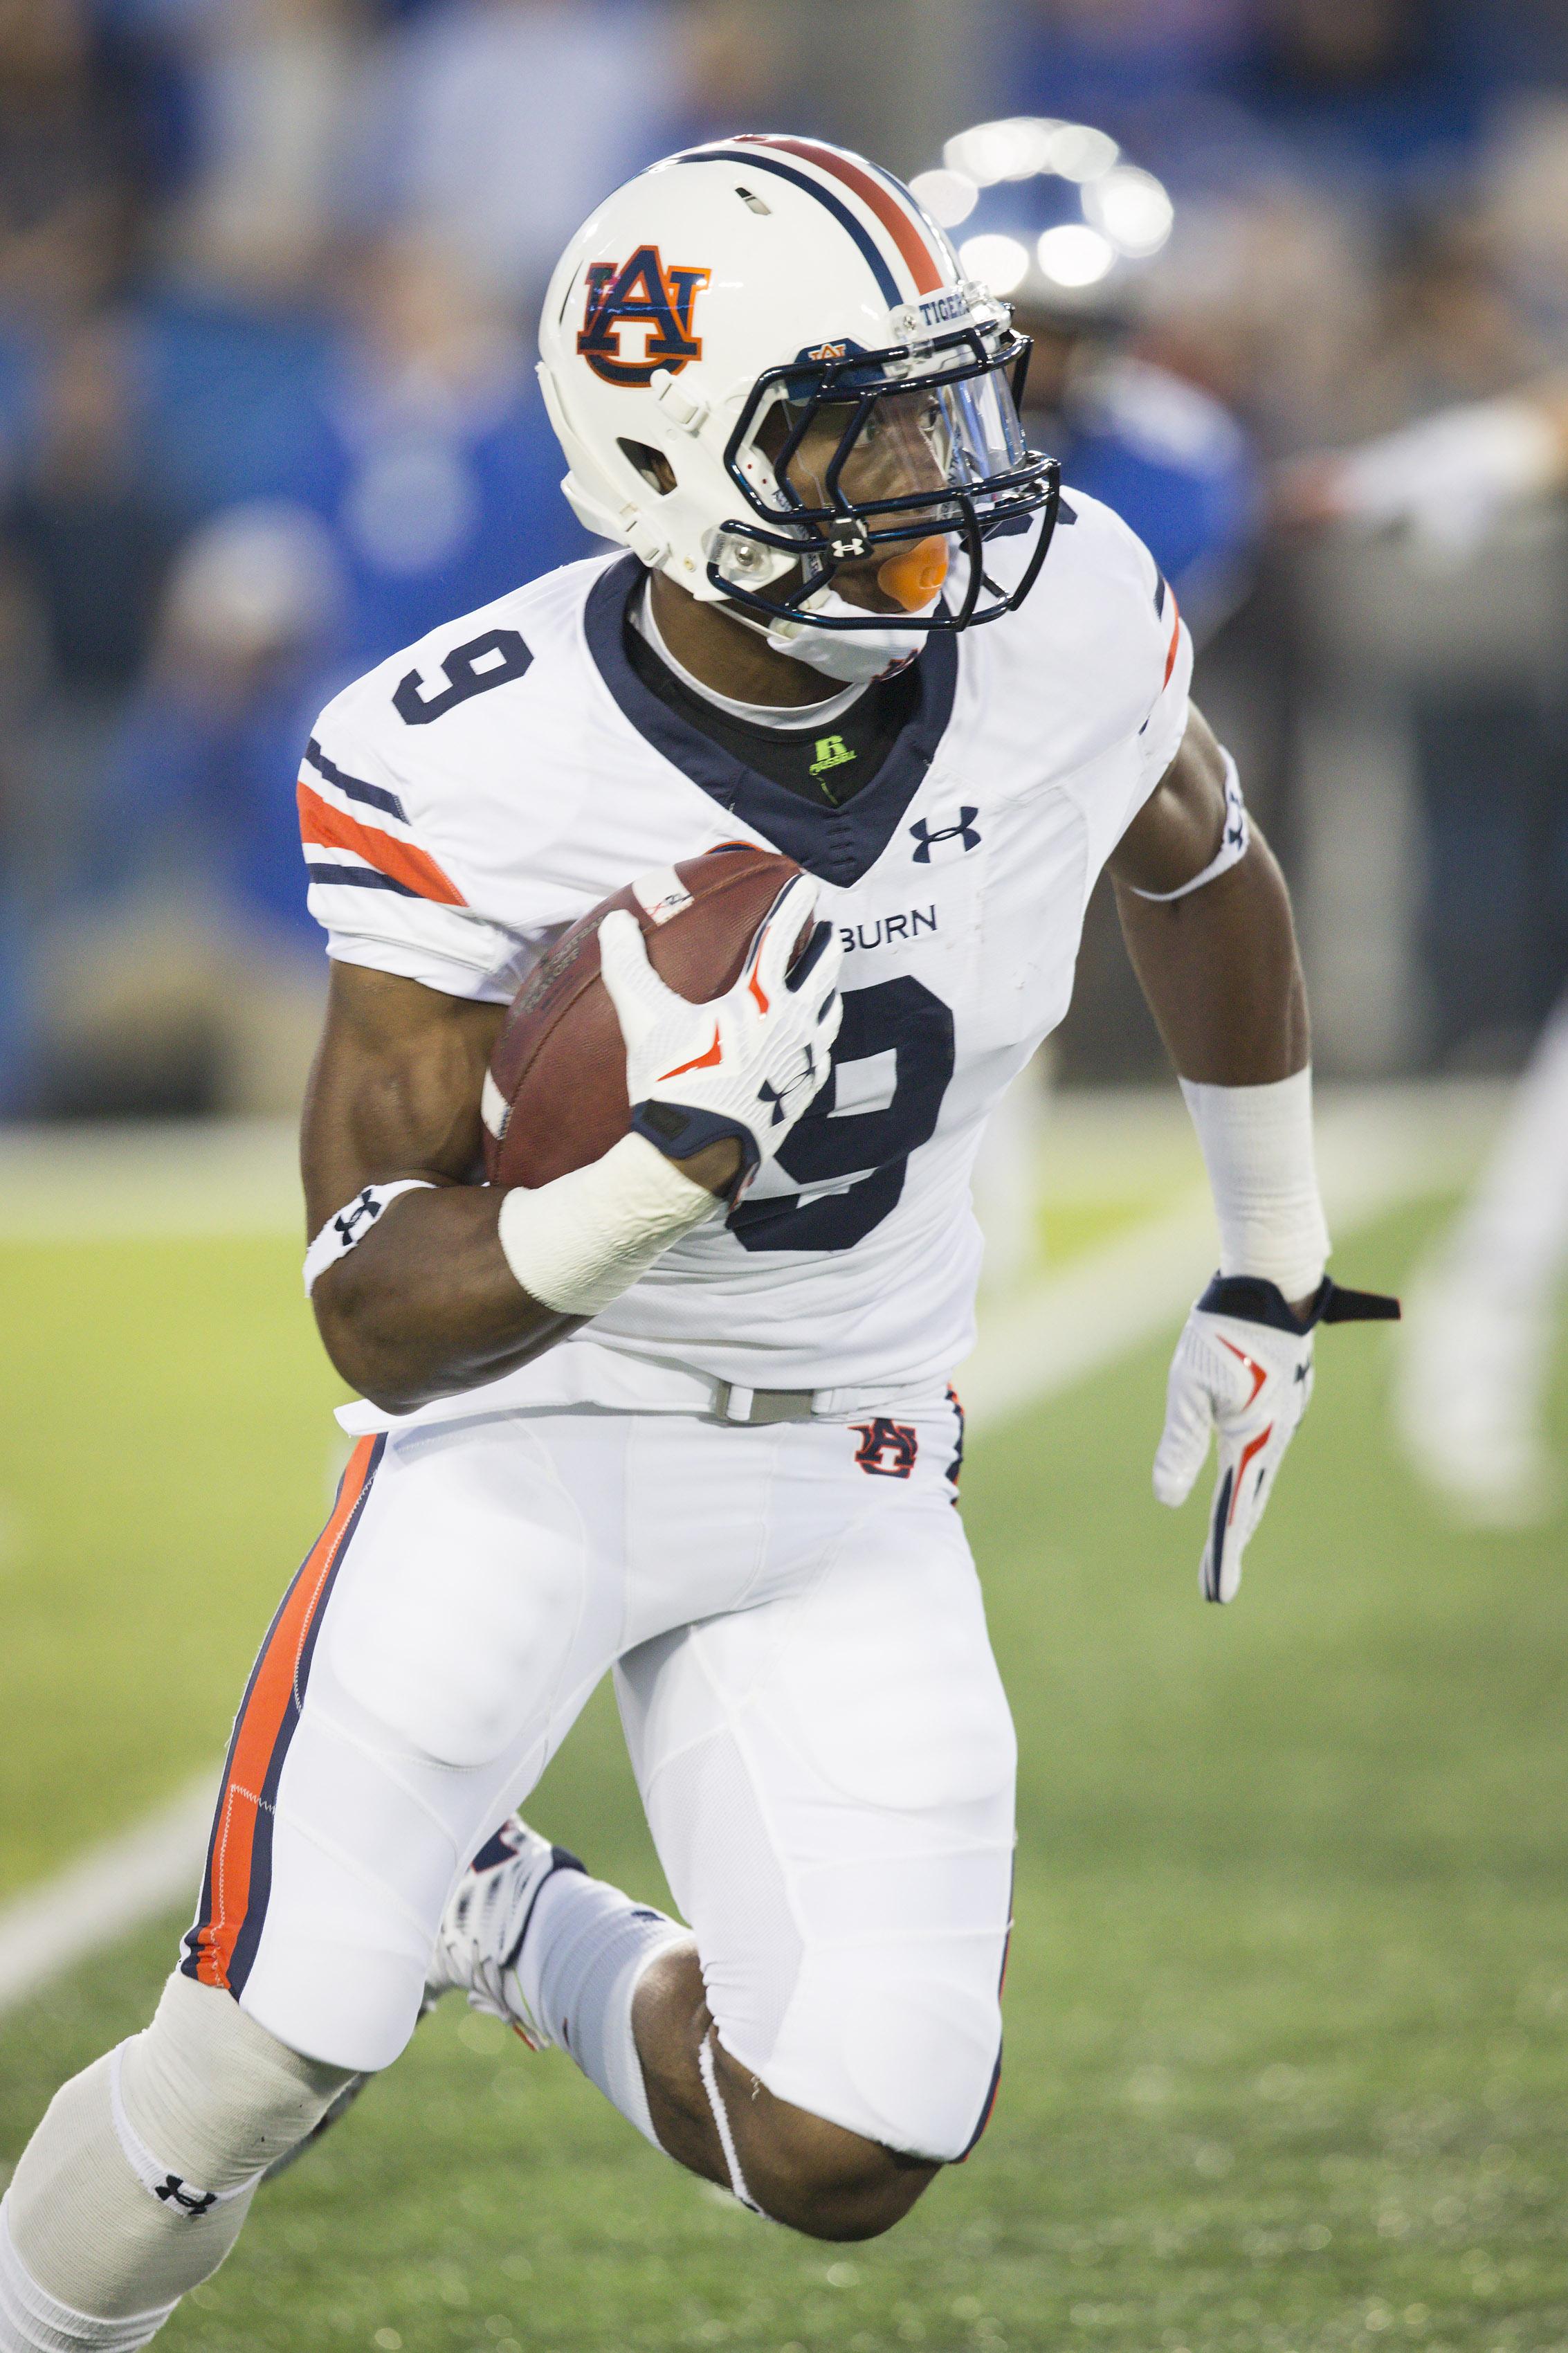 Auburn running back Roc Thomas runs the ball during the first half of an NCAA college football game against Kentucky, Thursday, Oct. 15, 2015, in Lexington, Ky. Auburn won 30-27. (AP Photo/David Stephenson)